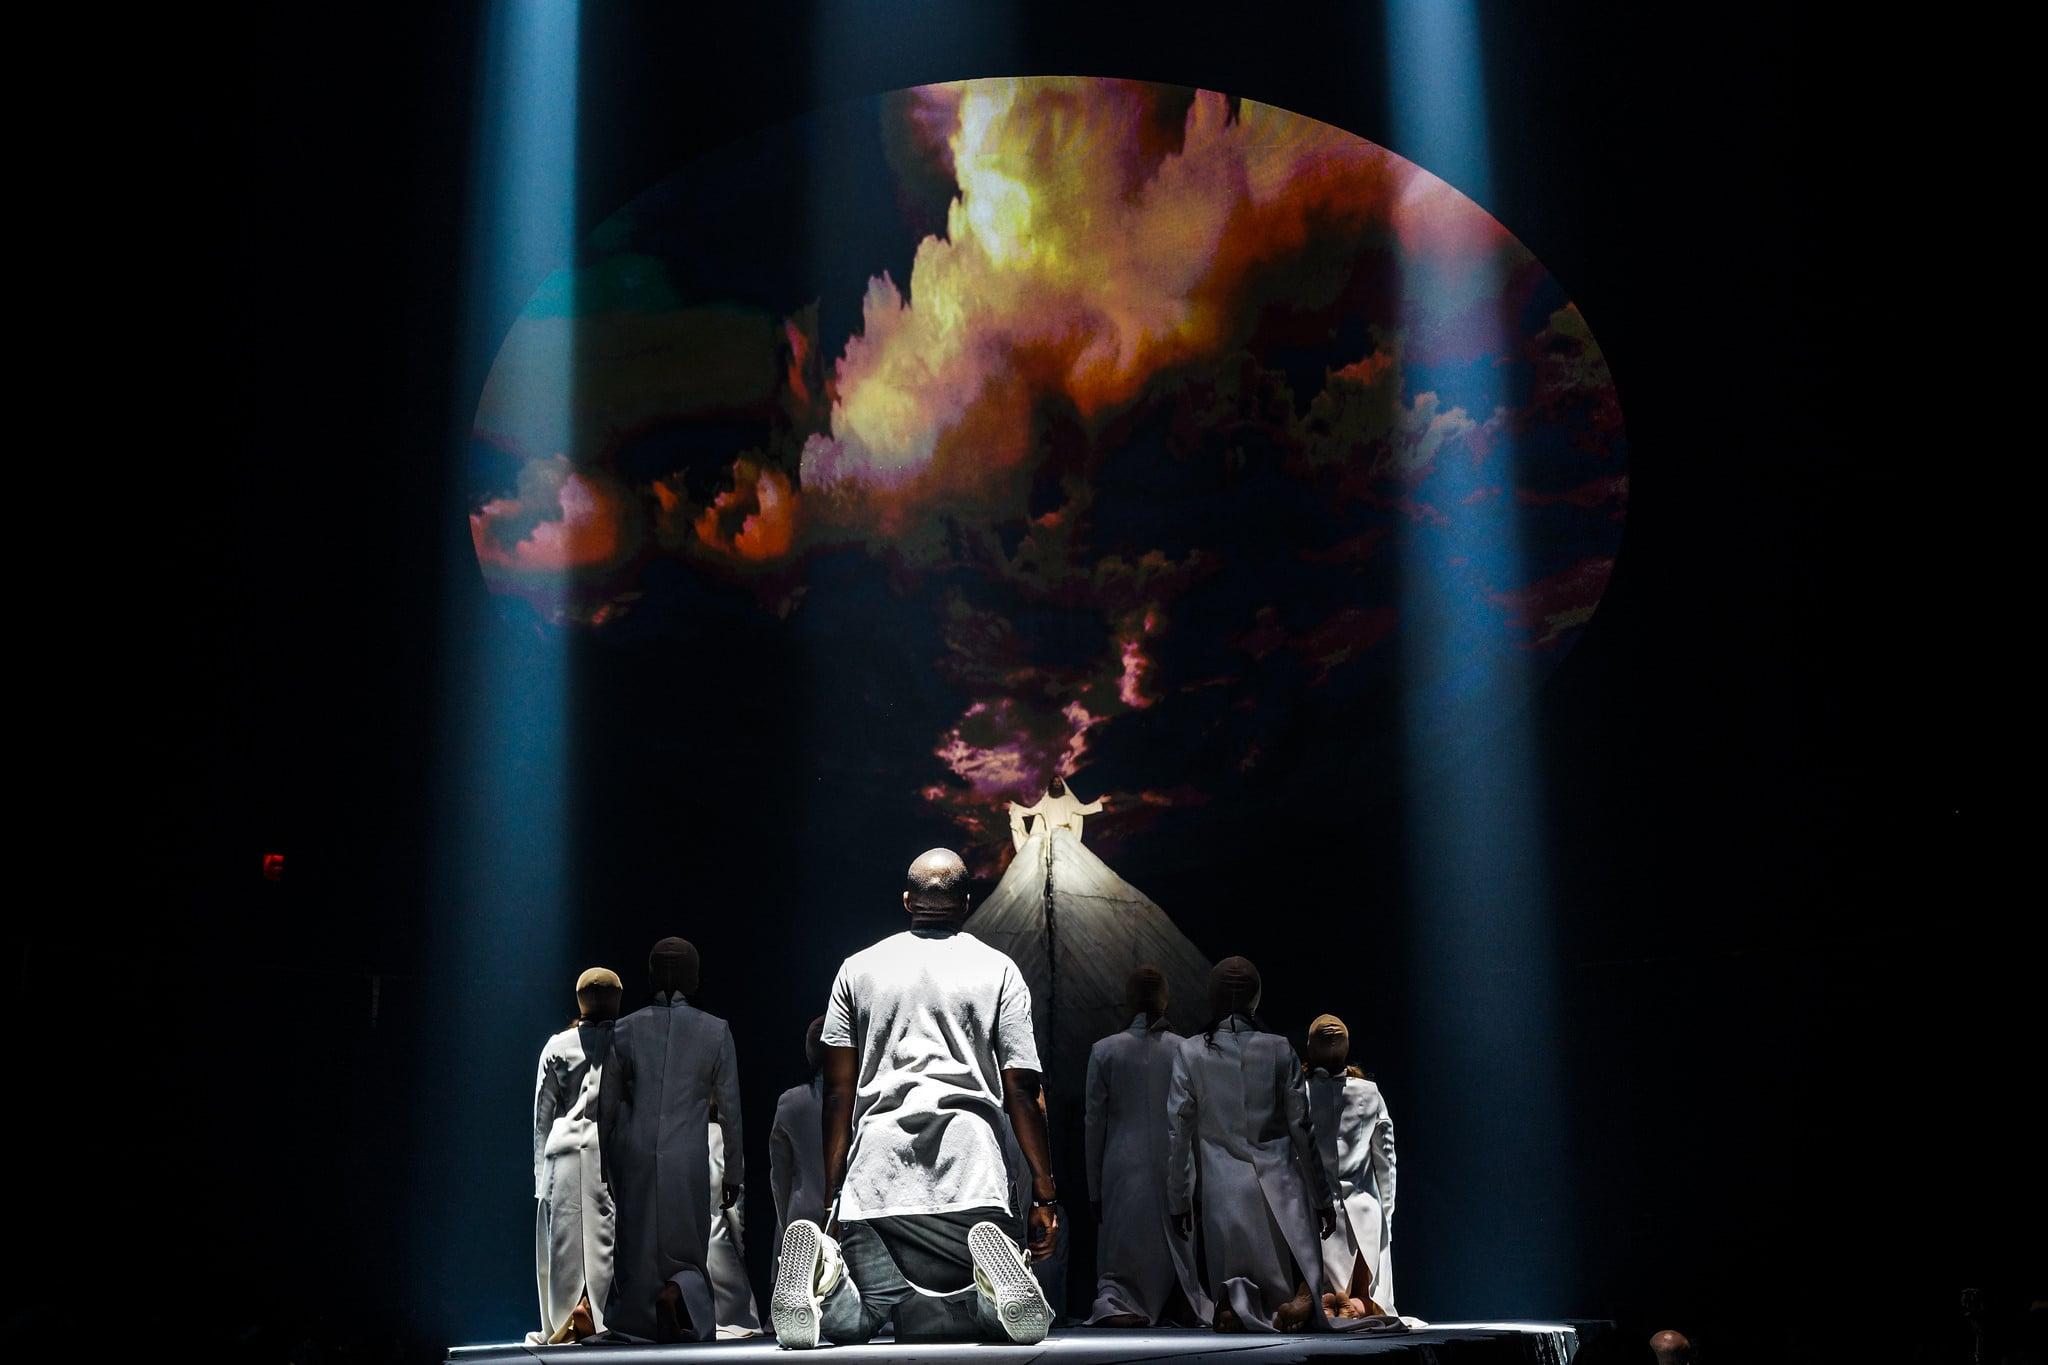 Www 3d Hd Live Wallpaper Com Kanye West Yeezus Tour Lightborne Communications